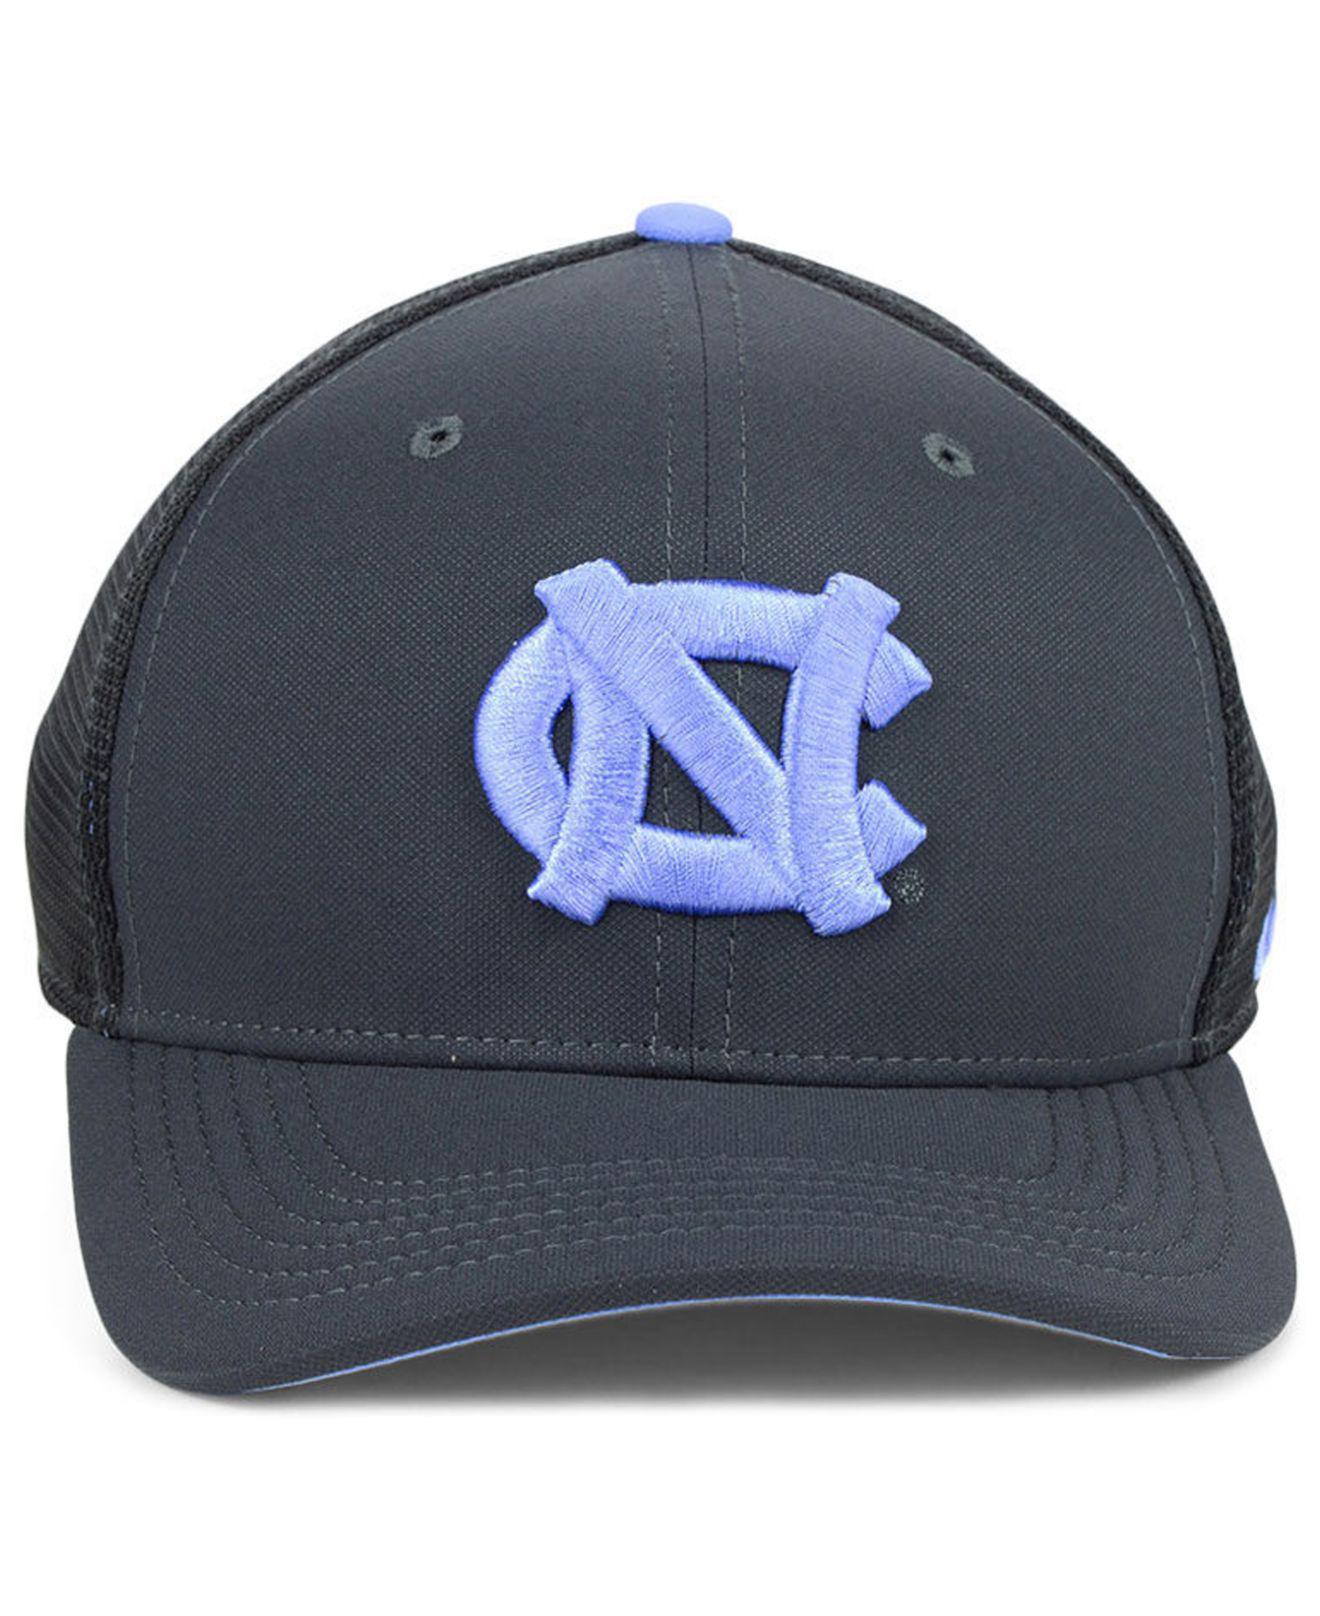 uk availability 11bb5 76f3b Lyst - Nike North Carolina Tar Heels Col Aro Swooshflex Cap in Gray for Men